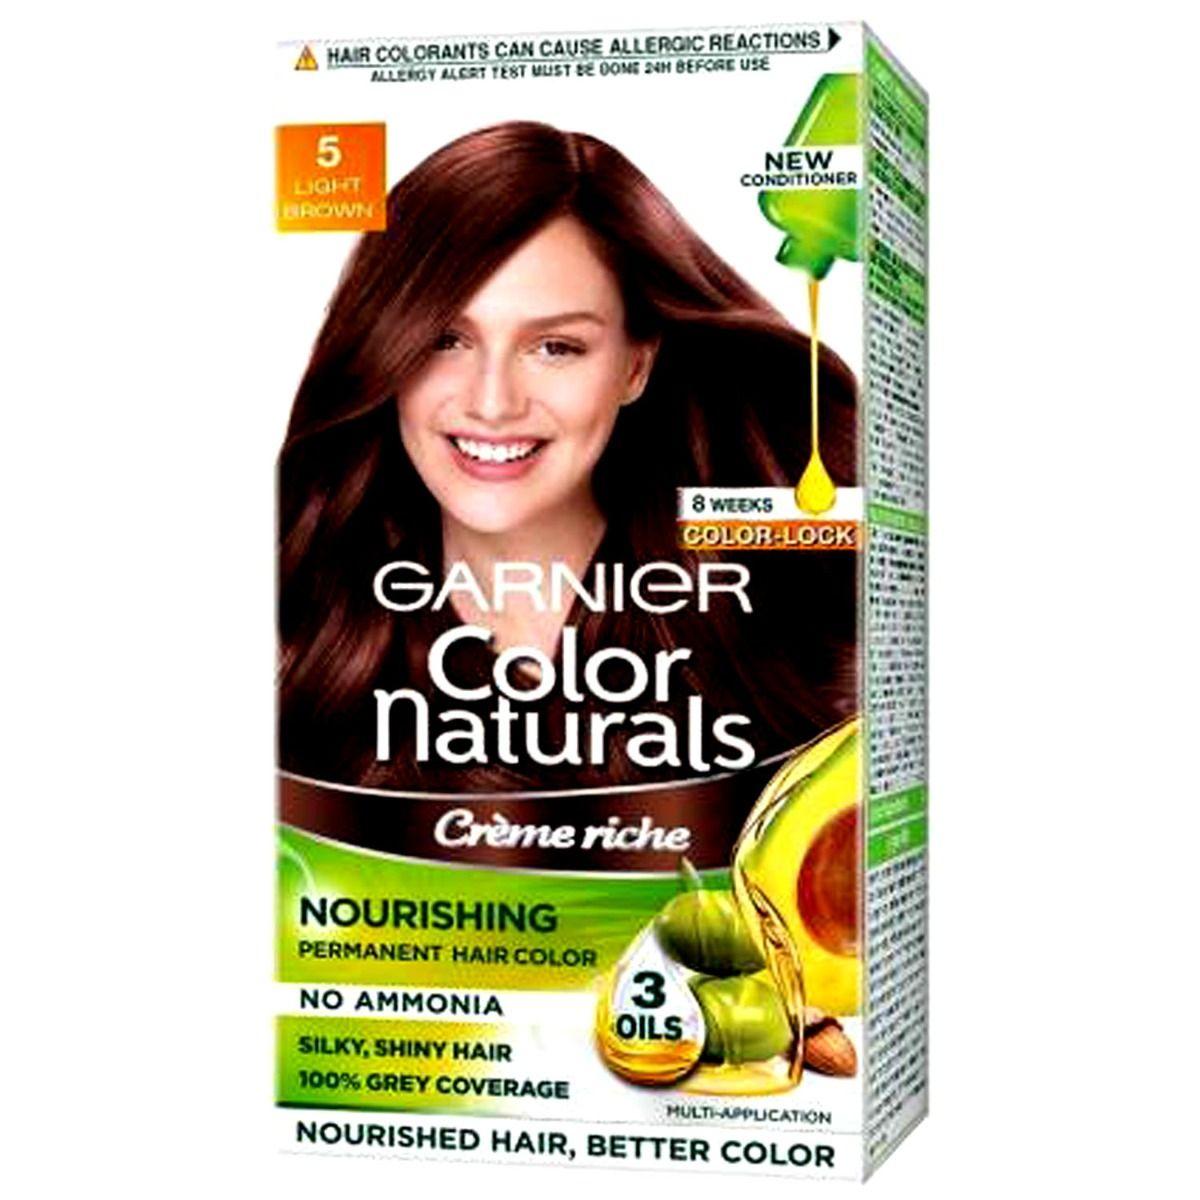 Garnier Color Naturals Cr?e Rich Light Brown, Shade 5